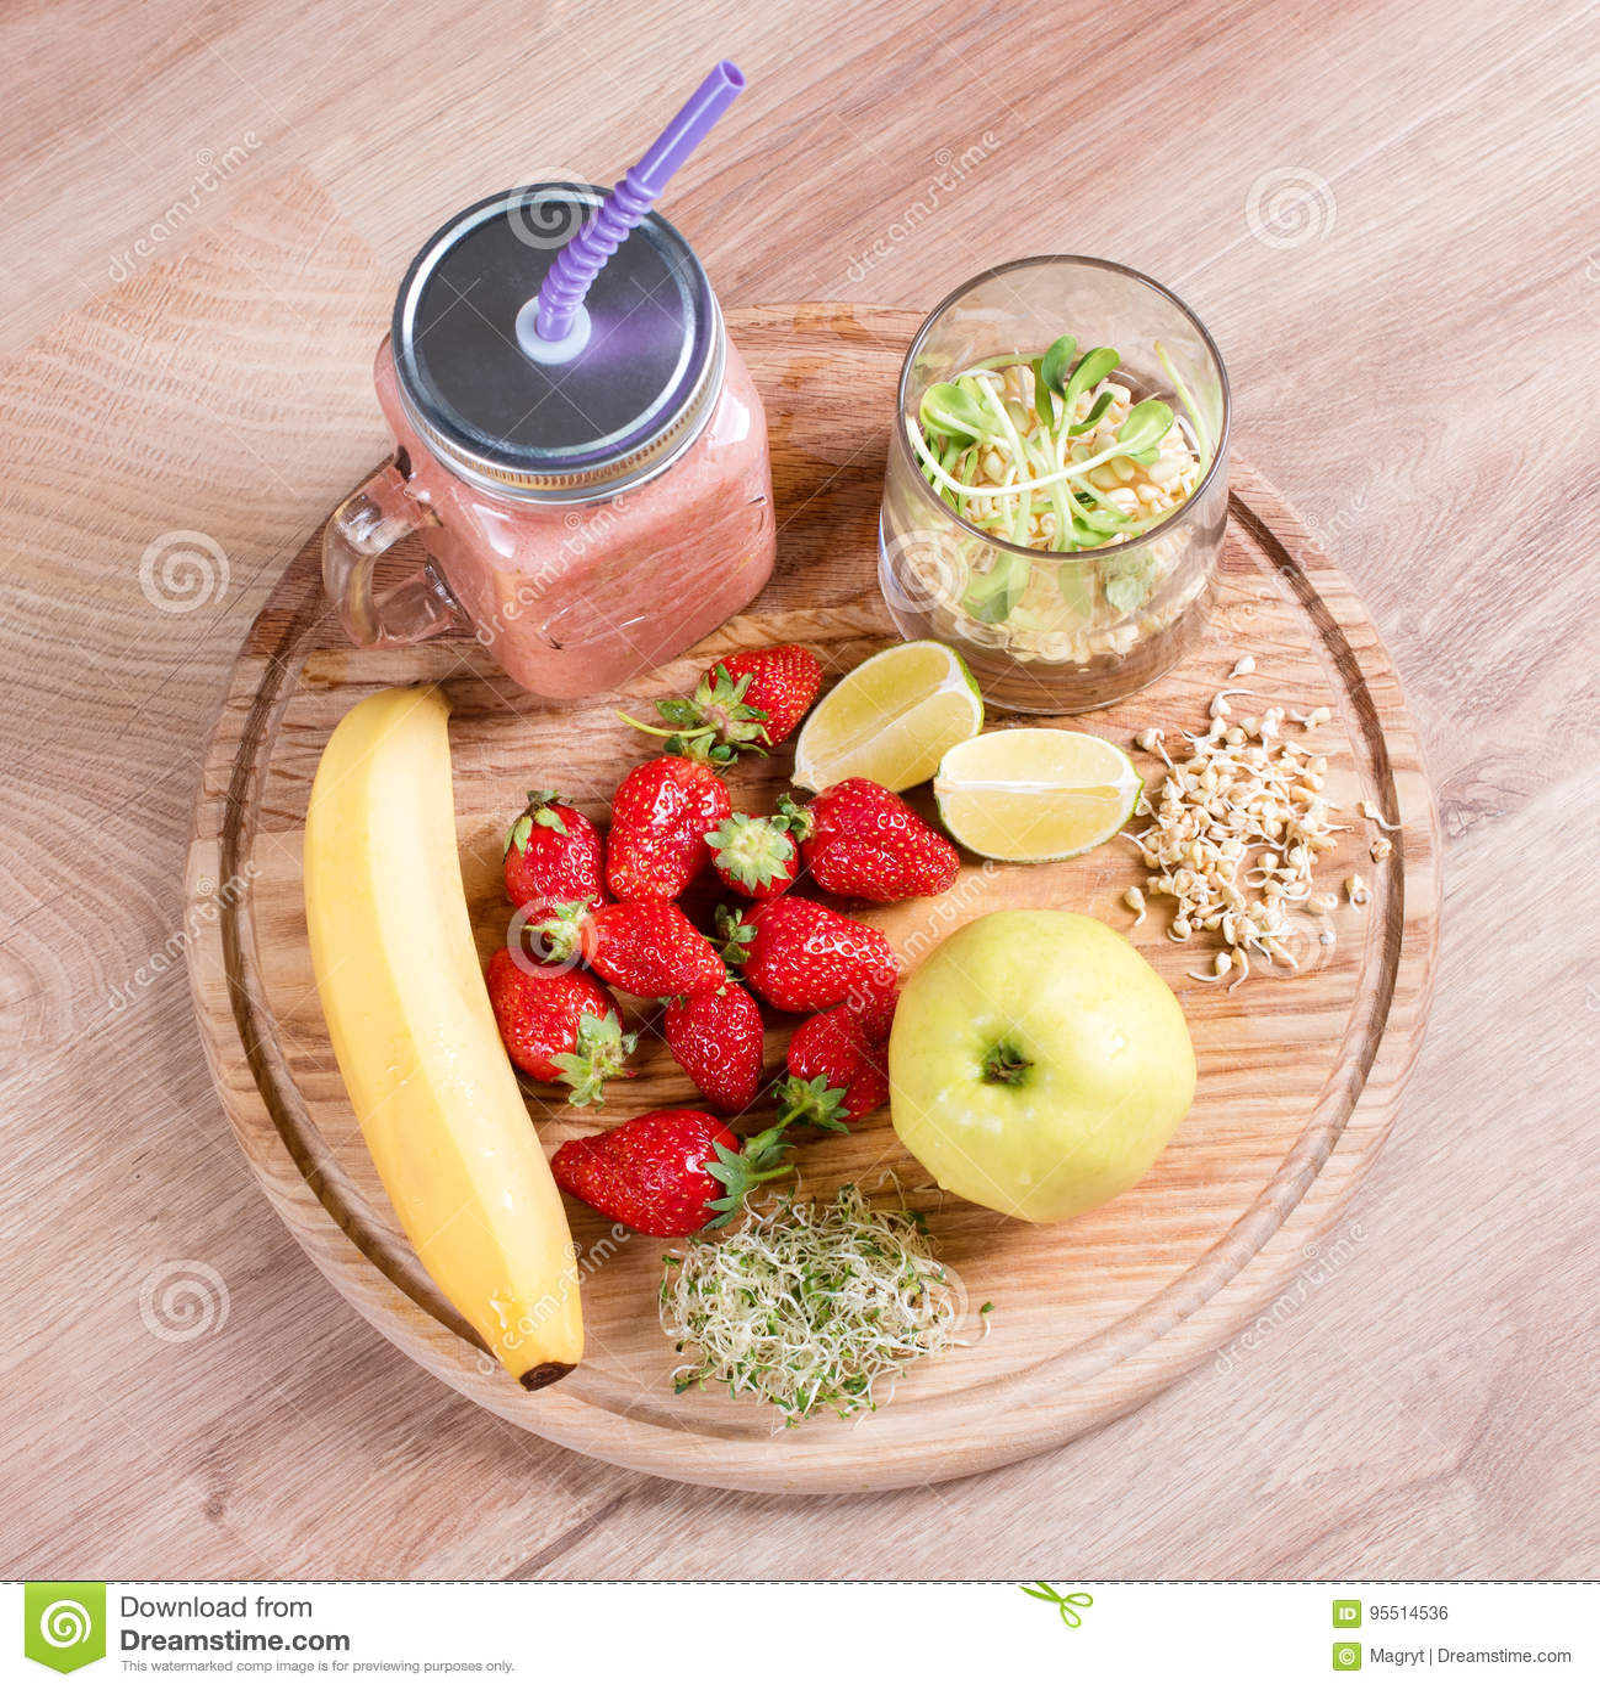 Detox Cleanse Drink, Fruits And Berries Smoothie Ingredients